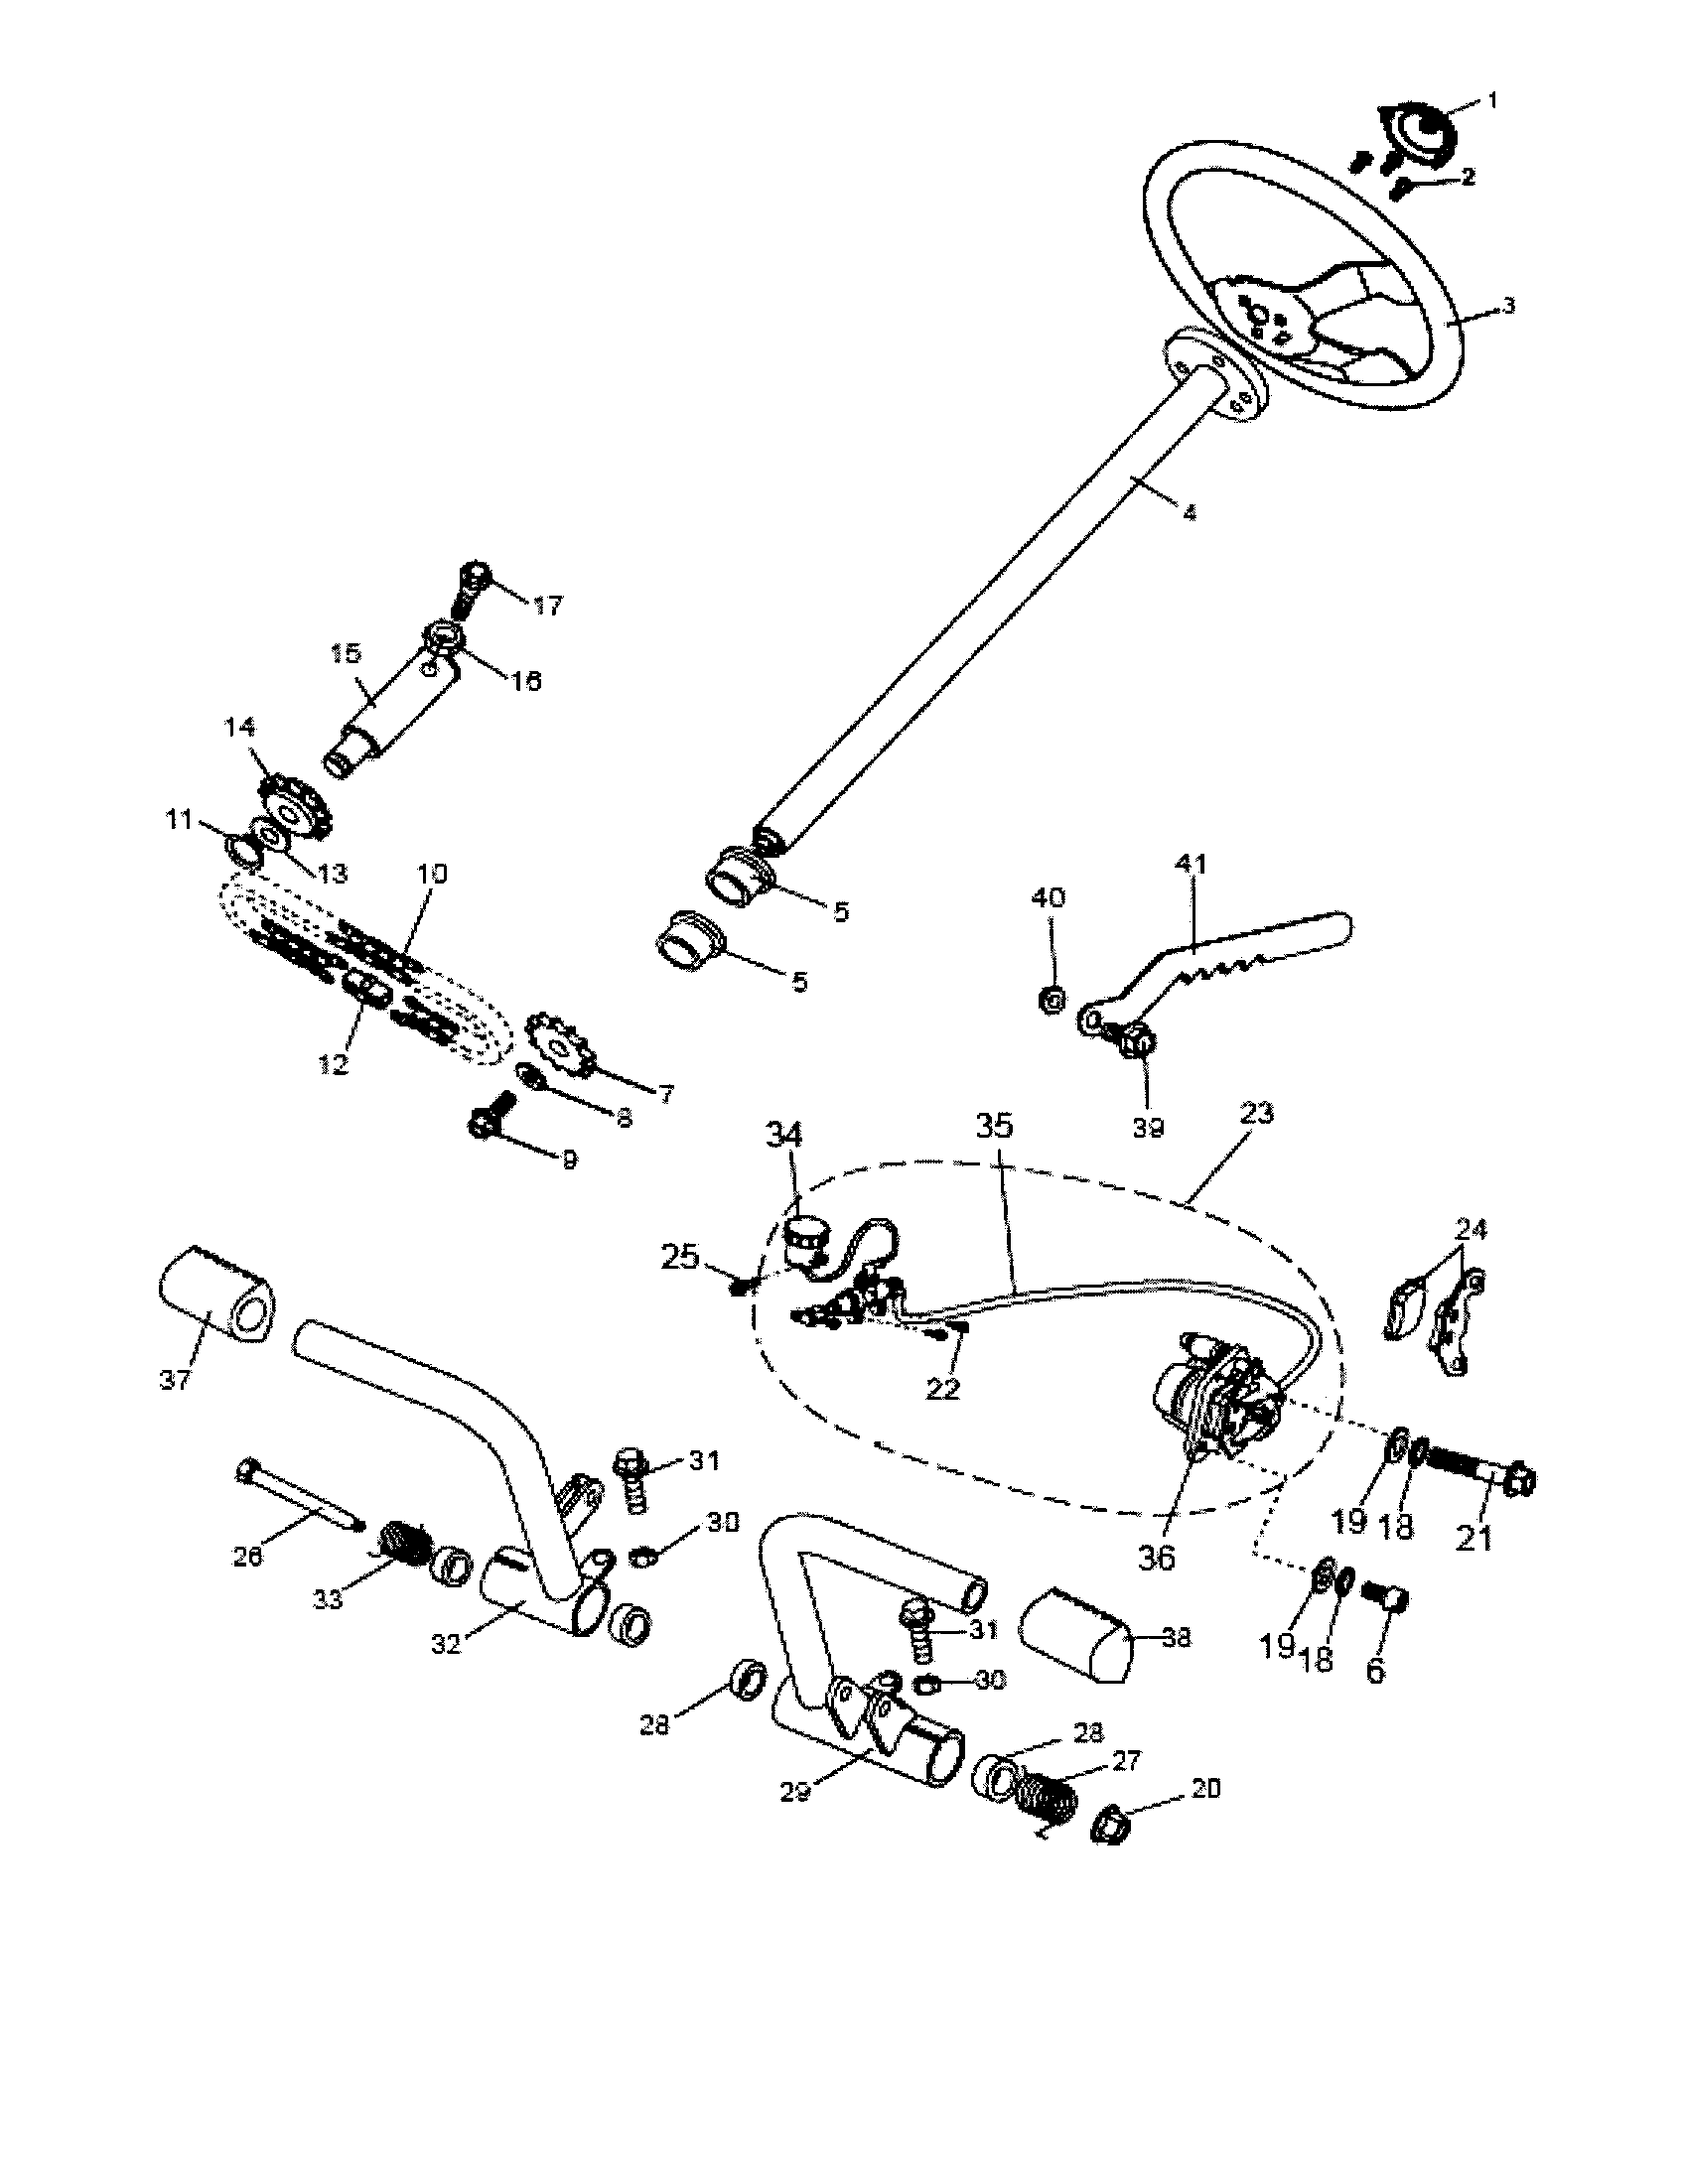 hight resolution of manco model 6150 gokarts minibikes genuine parts go kart throttle cable diagram manco go kart parts diagram